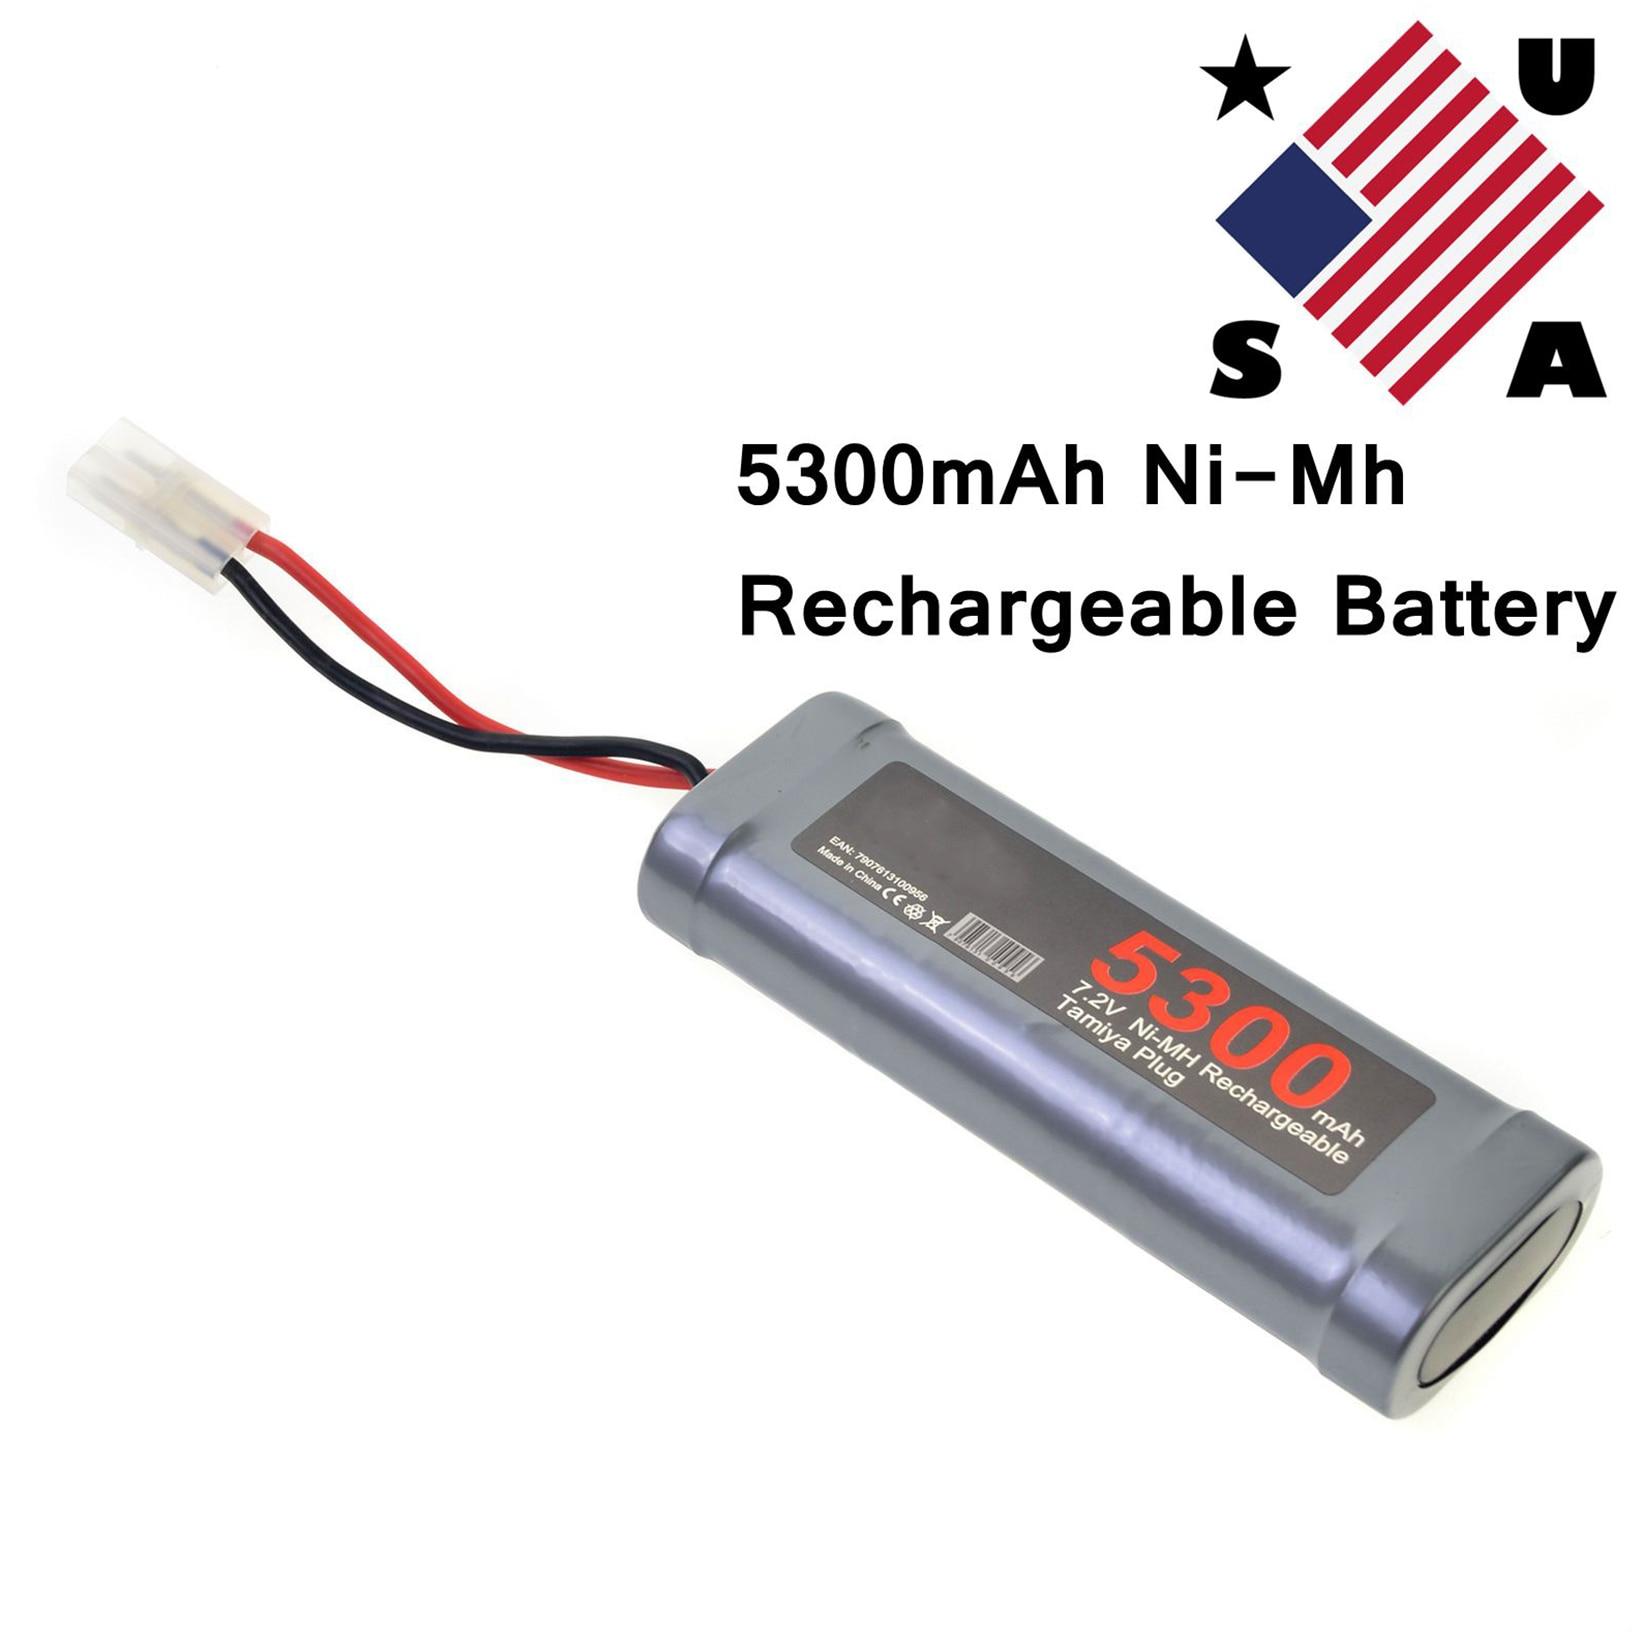 Charger USA 2 pcs 7.2V 3800mAh Ni-Mh rechargeable battery pack RC Tamiya Plug